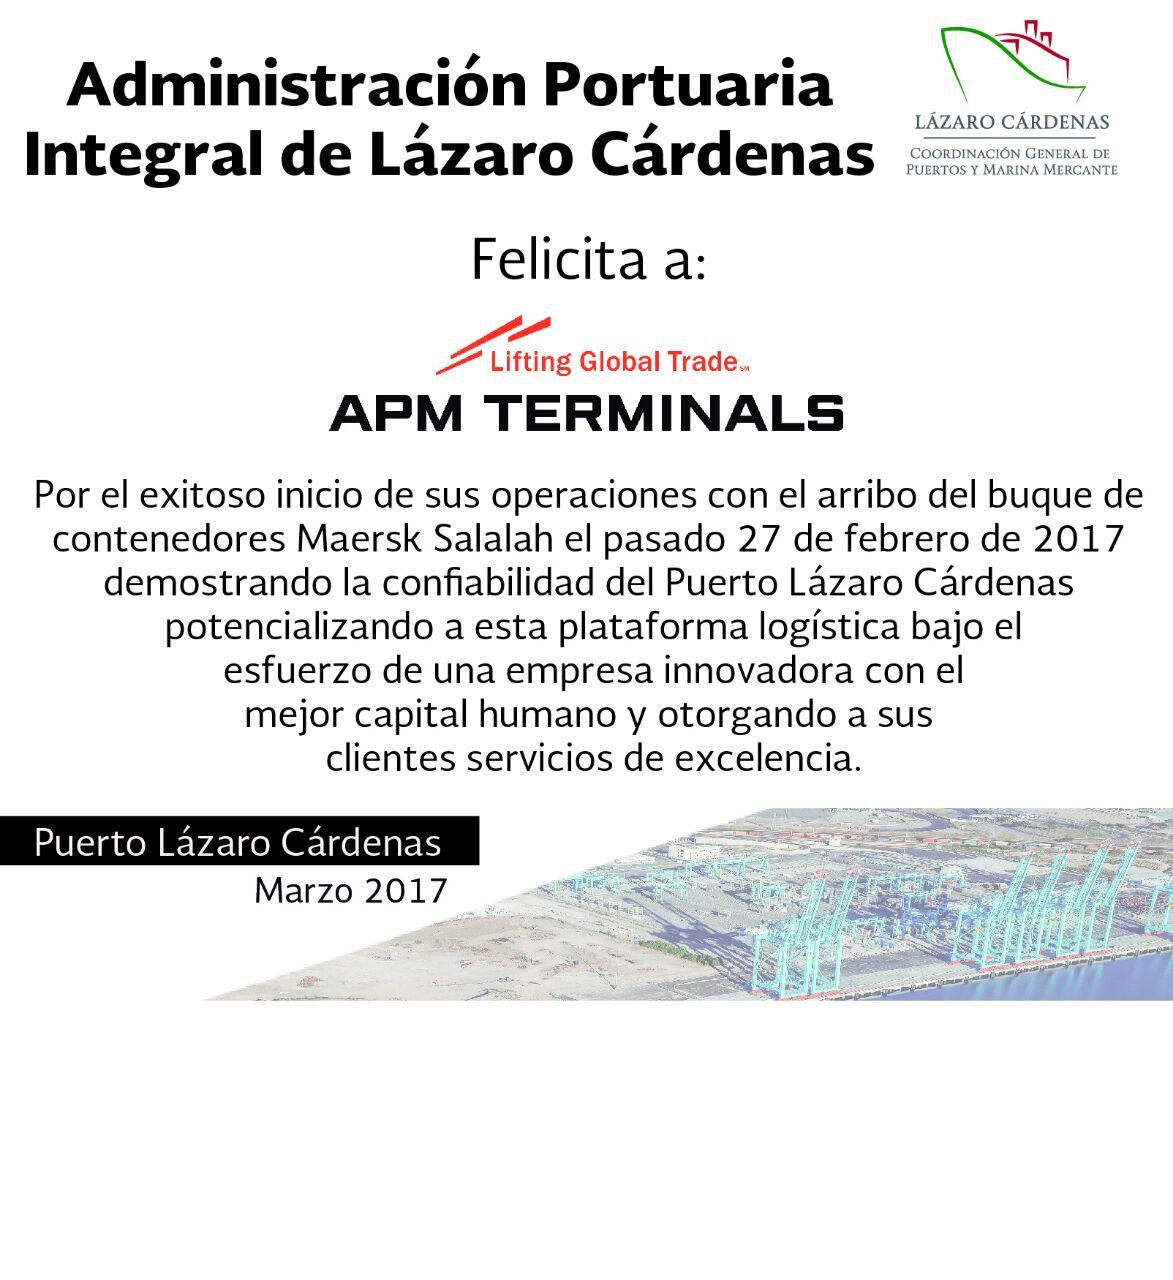 Administracion Portuaria Integral Lazaro Cardenas